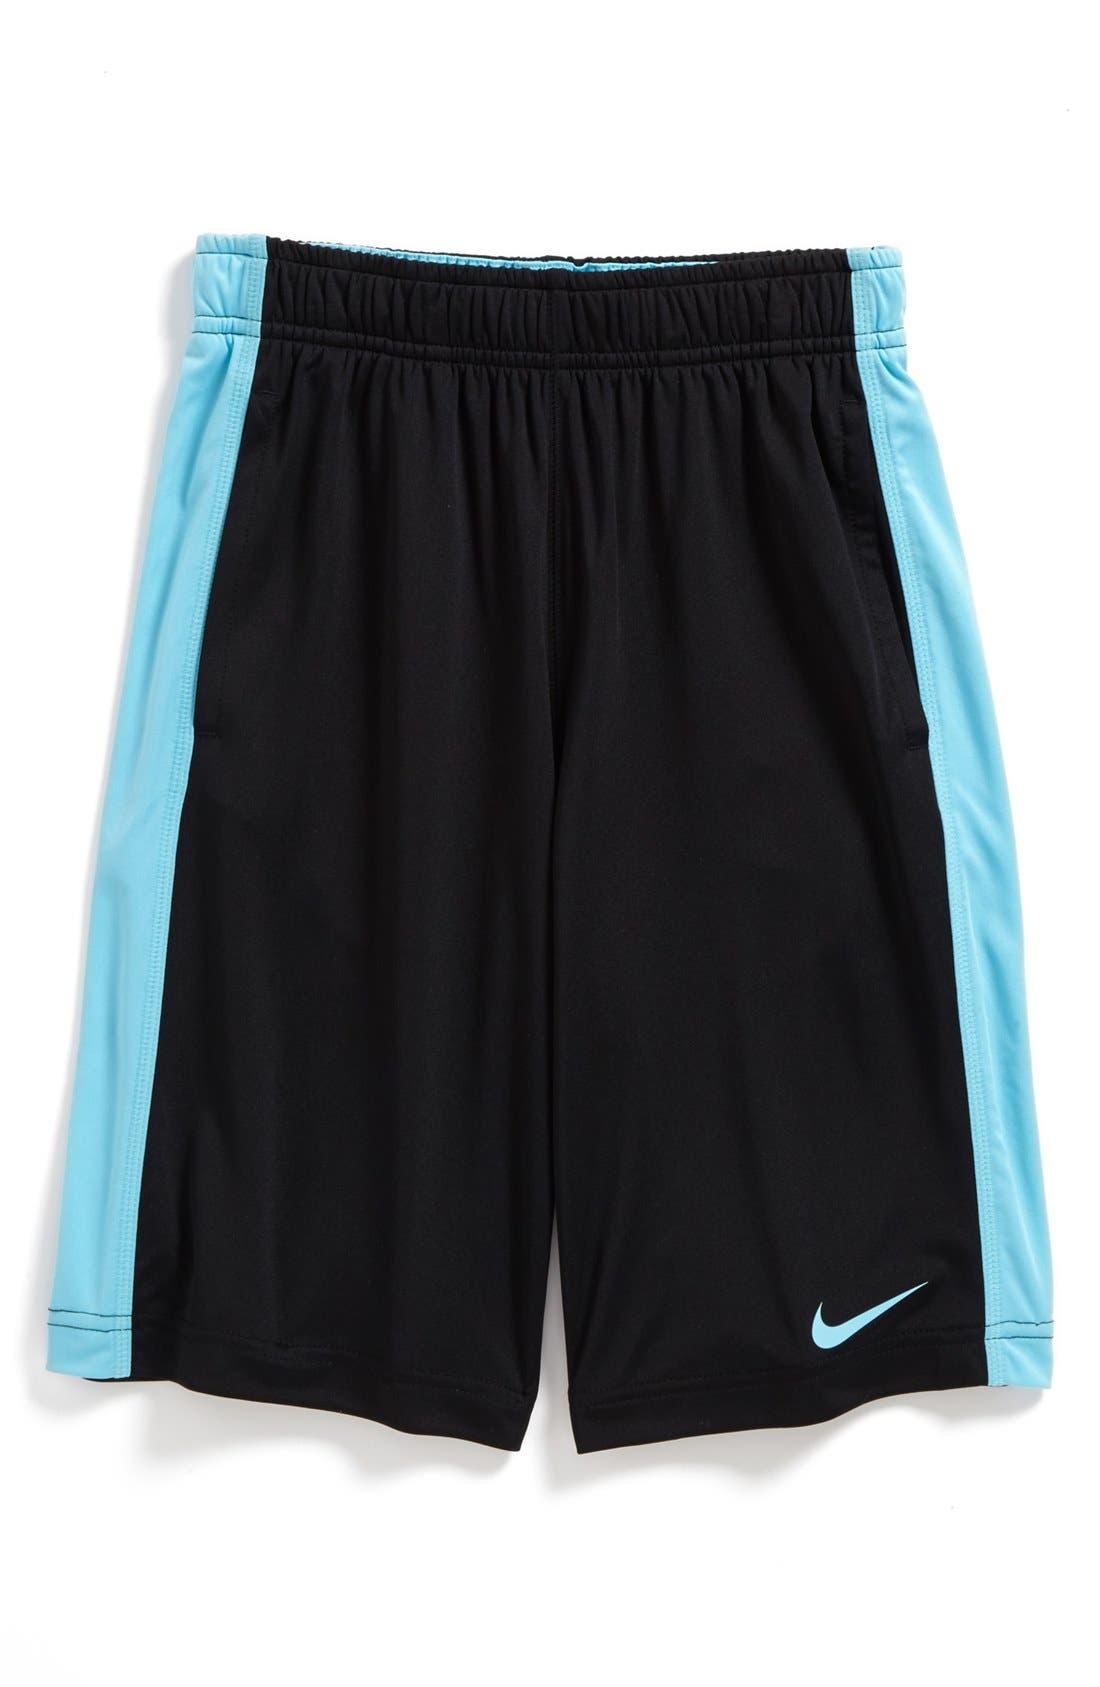 Alternate Image 1 Selected - Nike 'Fly' Dri-FIT Shorts (Big Boys)